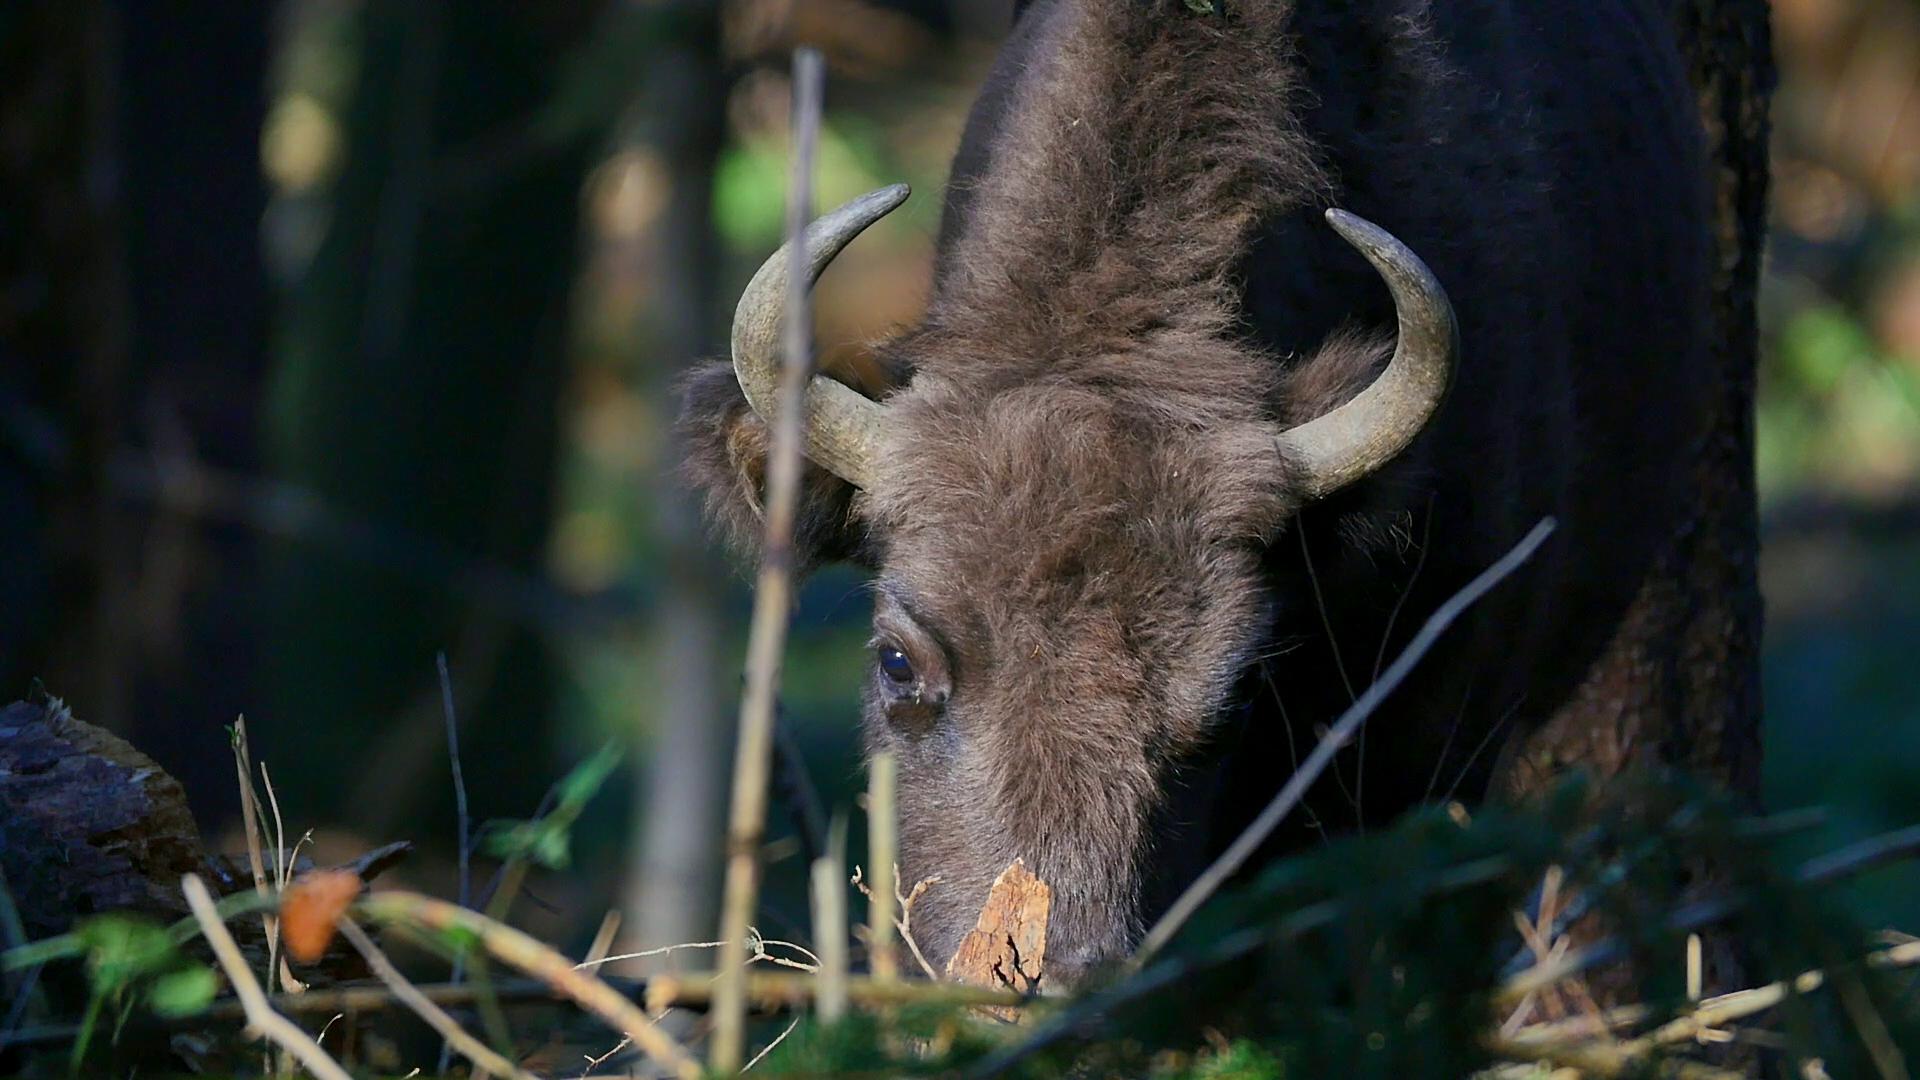 Natura Umana (4). Romania, una dintre putinele tari din lume in care traiesc liberi zimbri